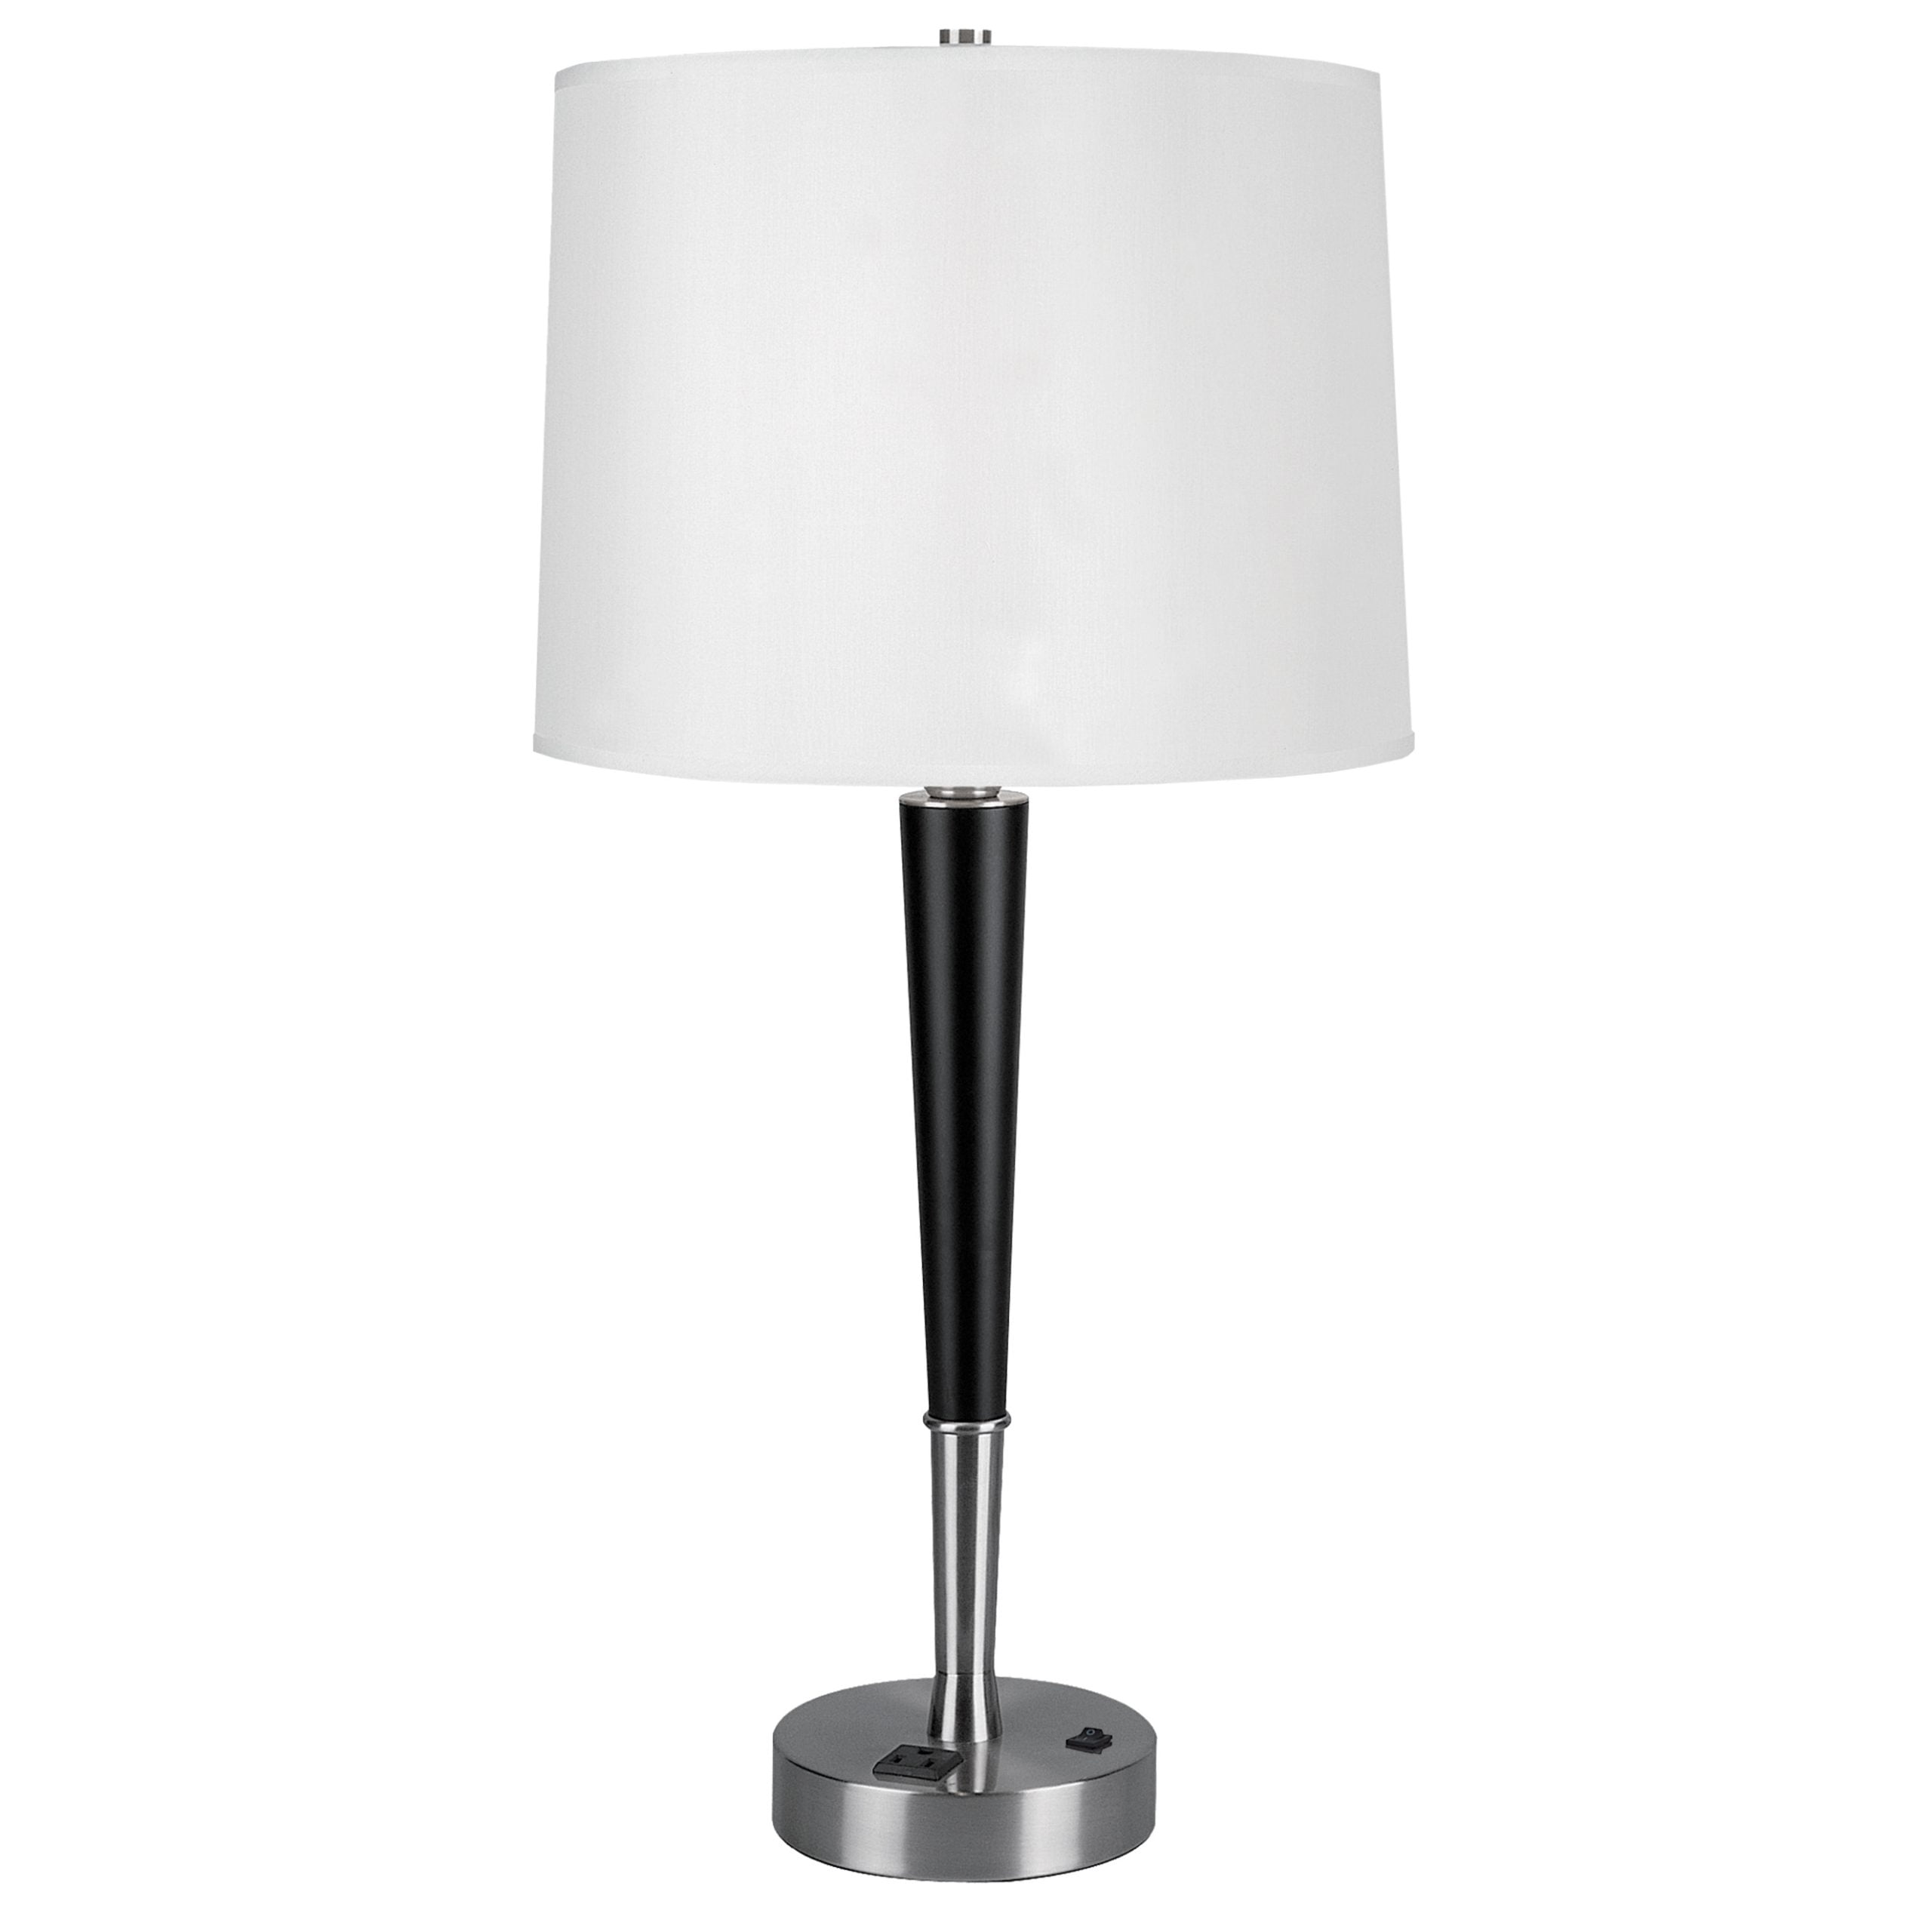 City Light End Table Lamp